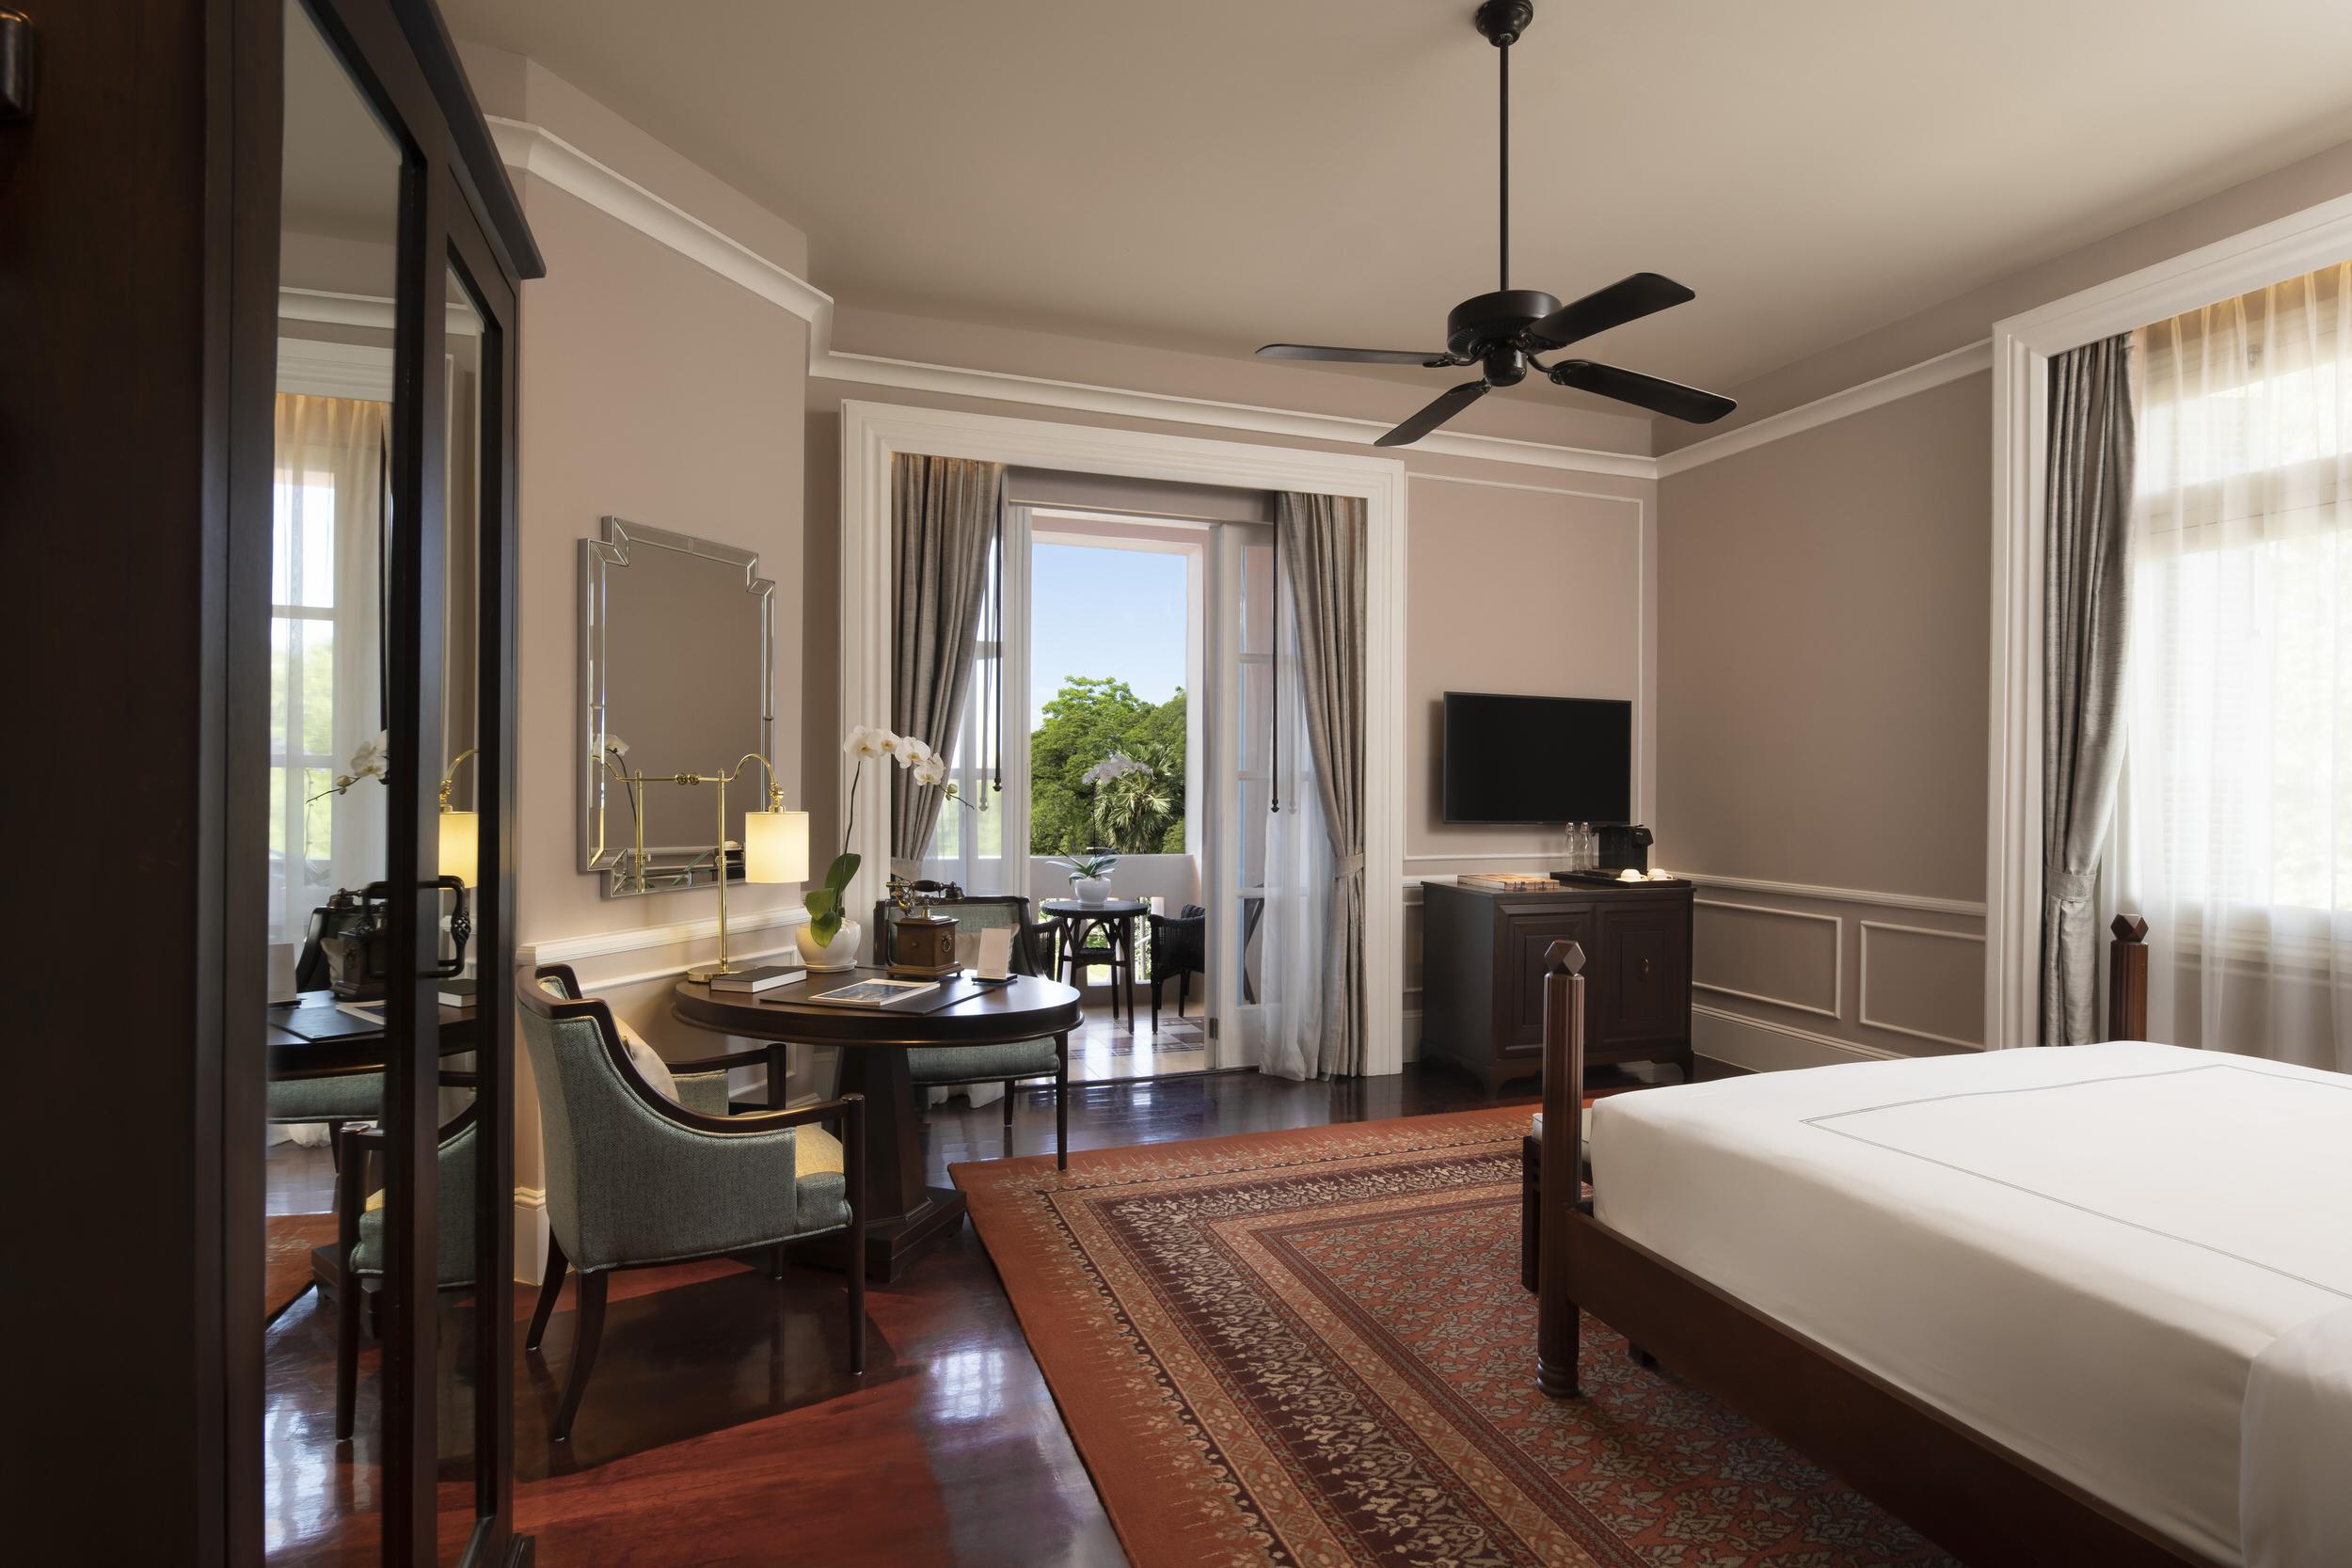 Photo Credit: Raffles Grand Hotel D'Angkor